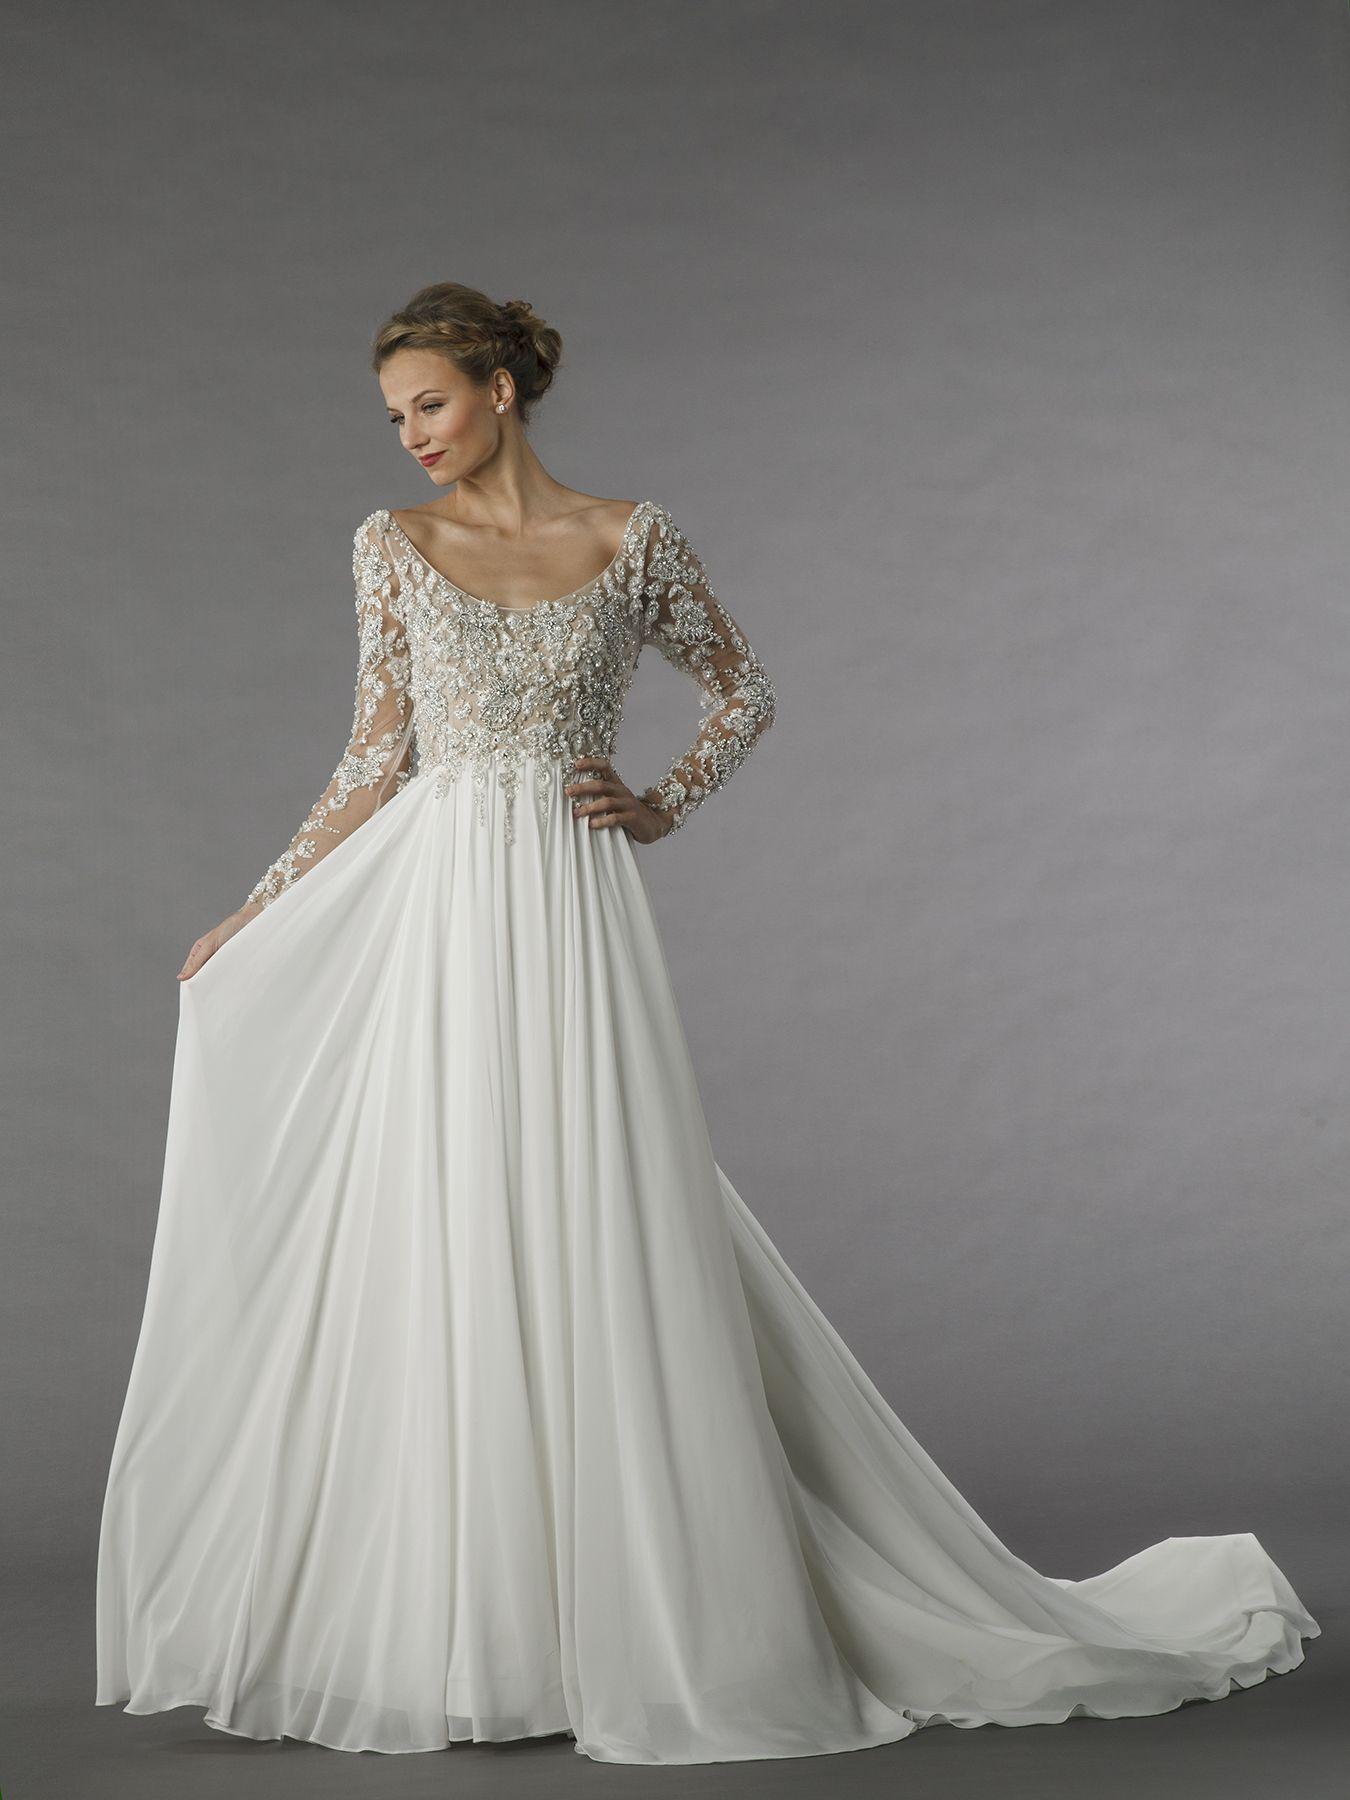 Wedding   Dress. Alita Graham with a lace top. A dreamy dress ...